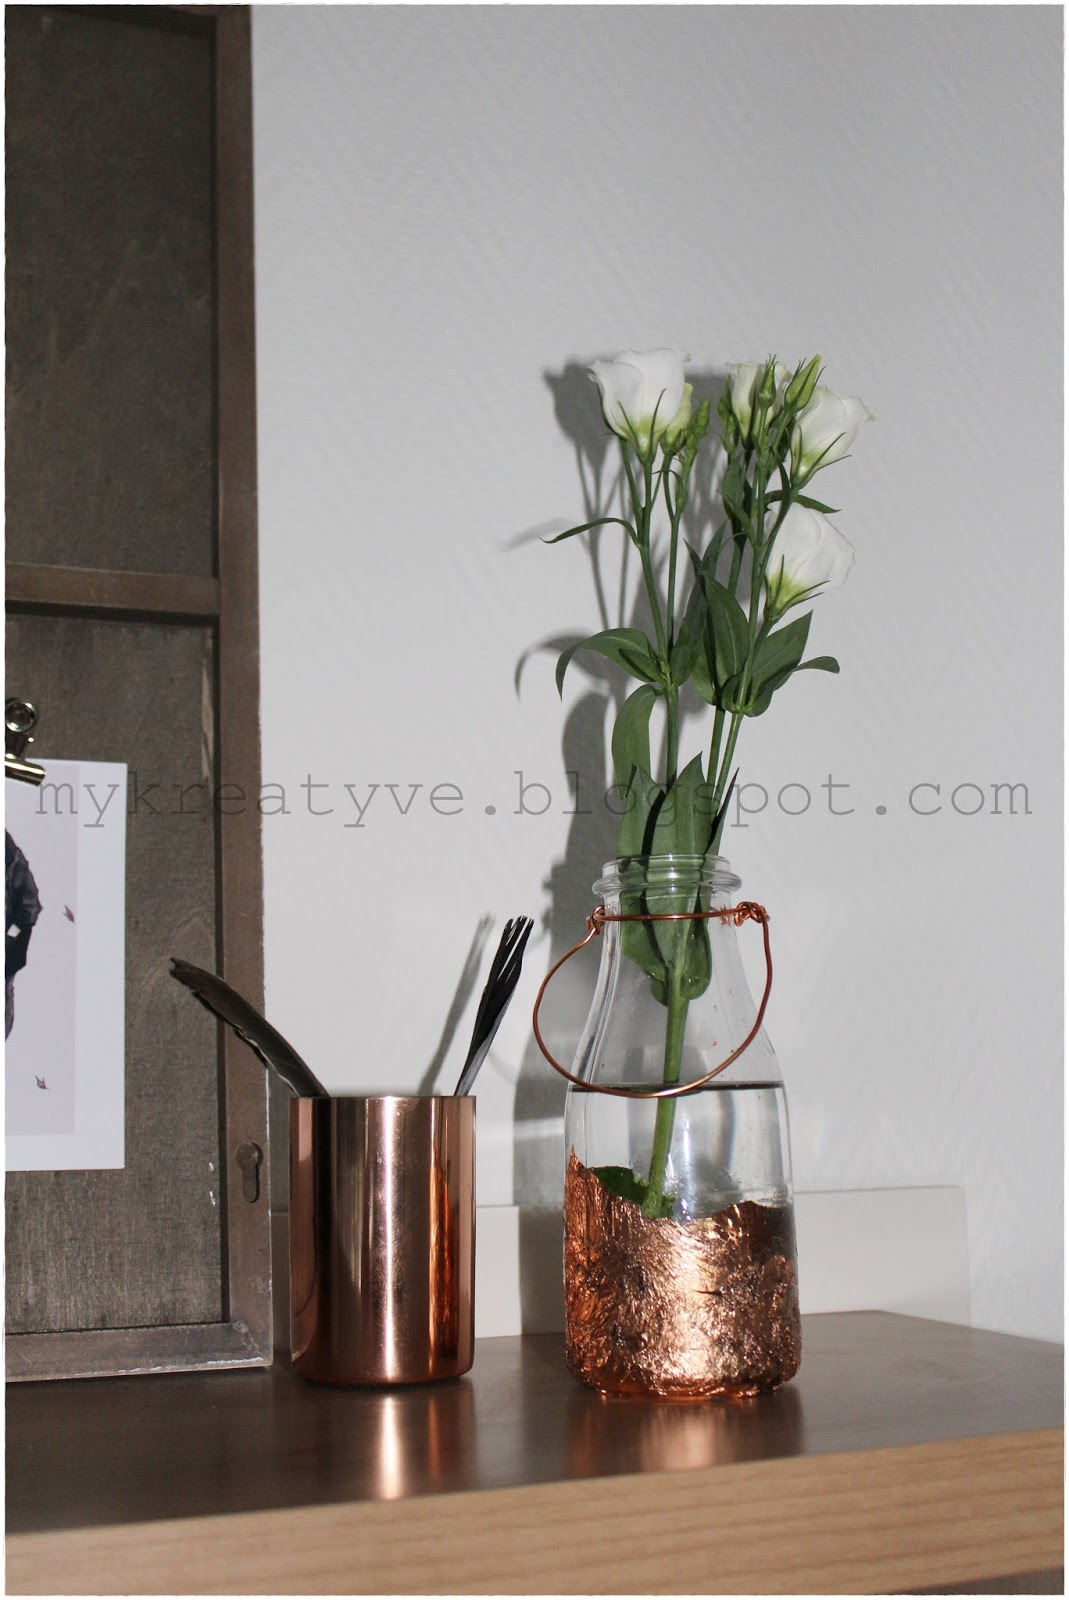 kreatyve diy flaschen vase mit blattkupfer. Black Bedroom Furniture Sets. Home Design Ideas